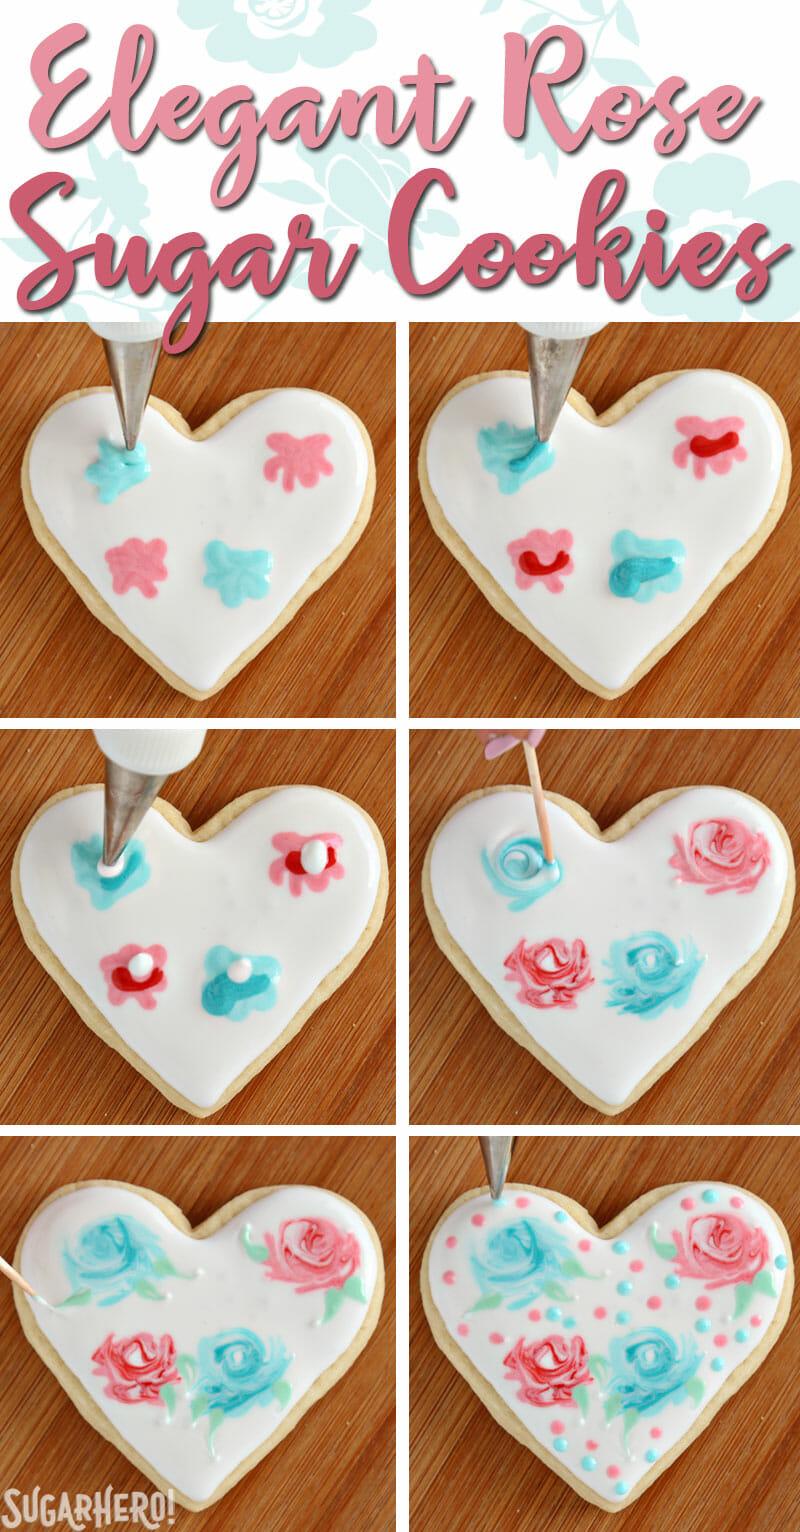 10 Amazing Easy Sugar Cookie Decorating Ideas valentines day sugar cookies sugarhero 2021